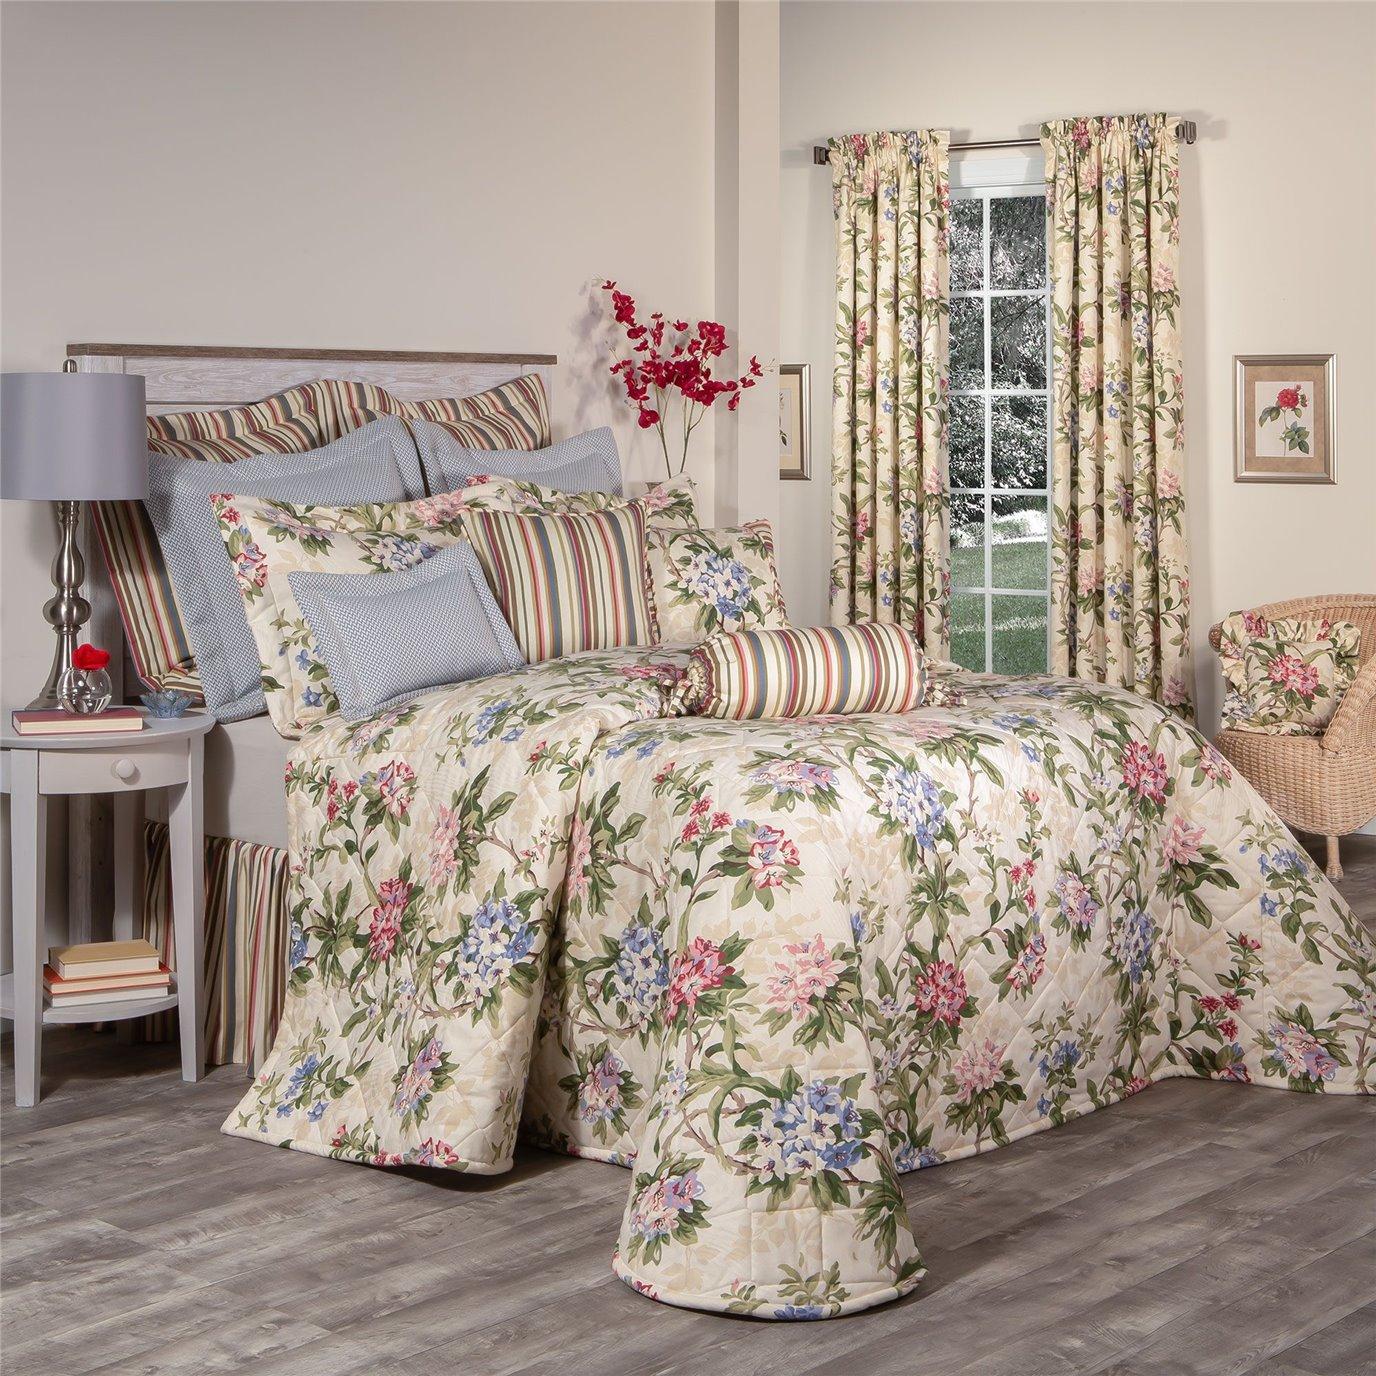 Hillhouse King  Bedspread